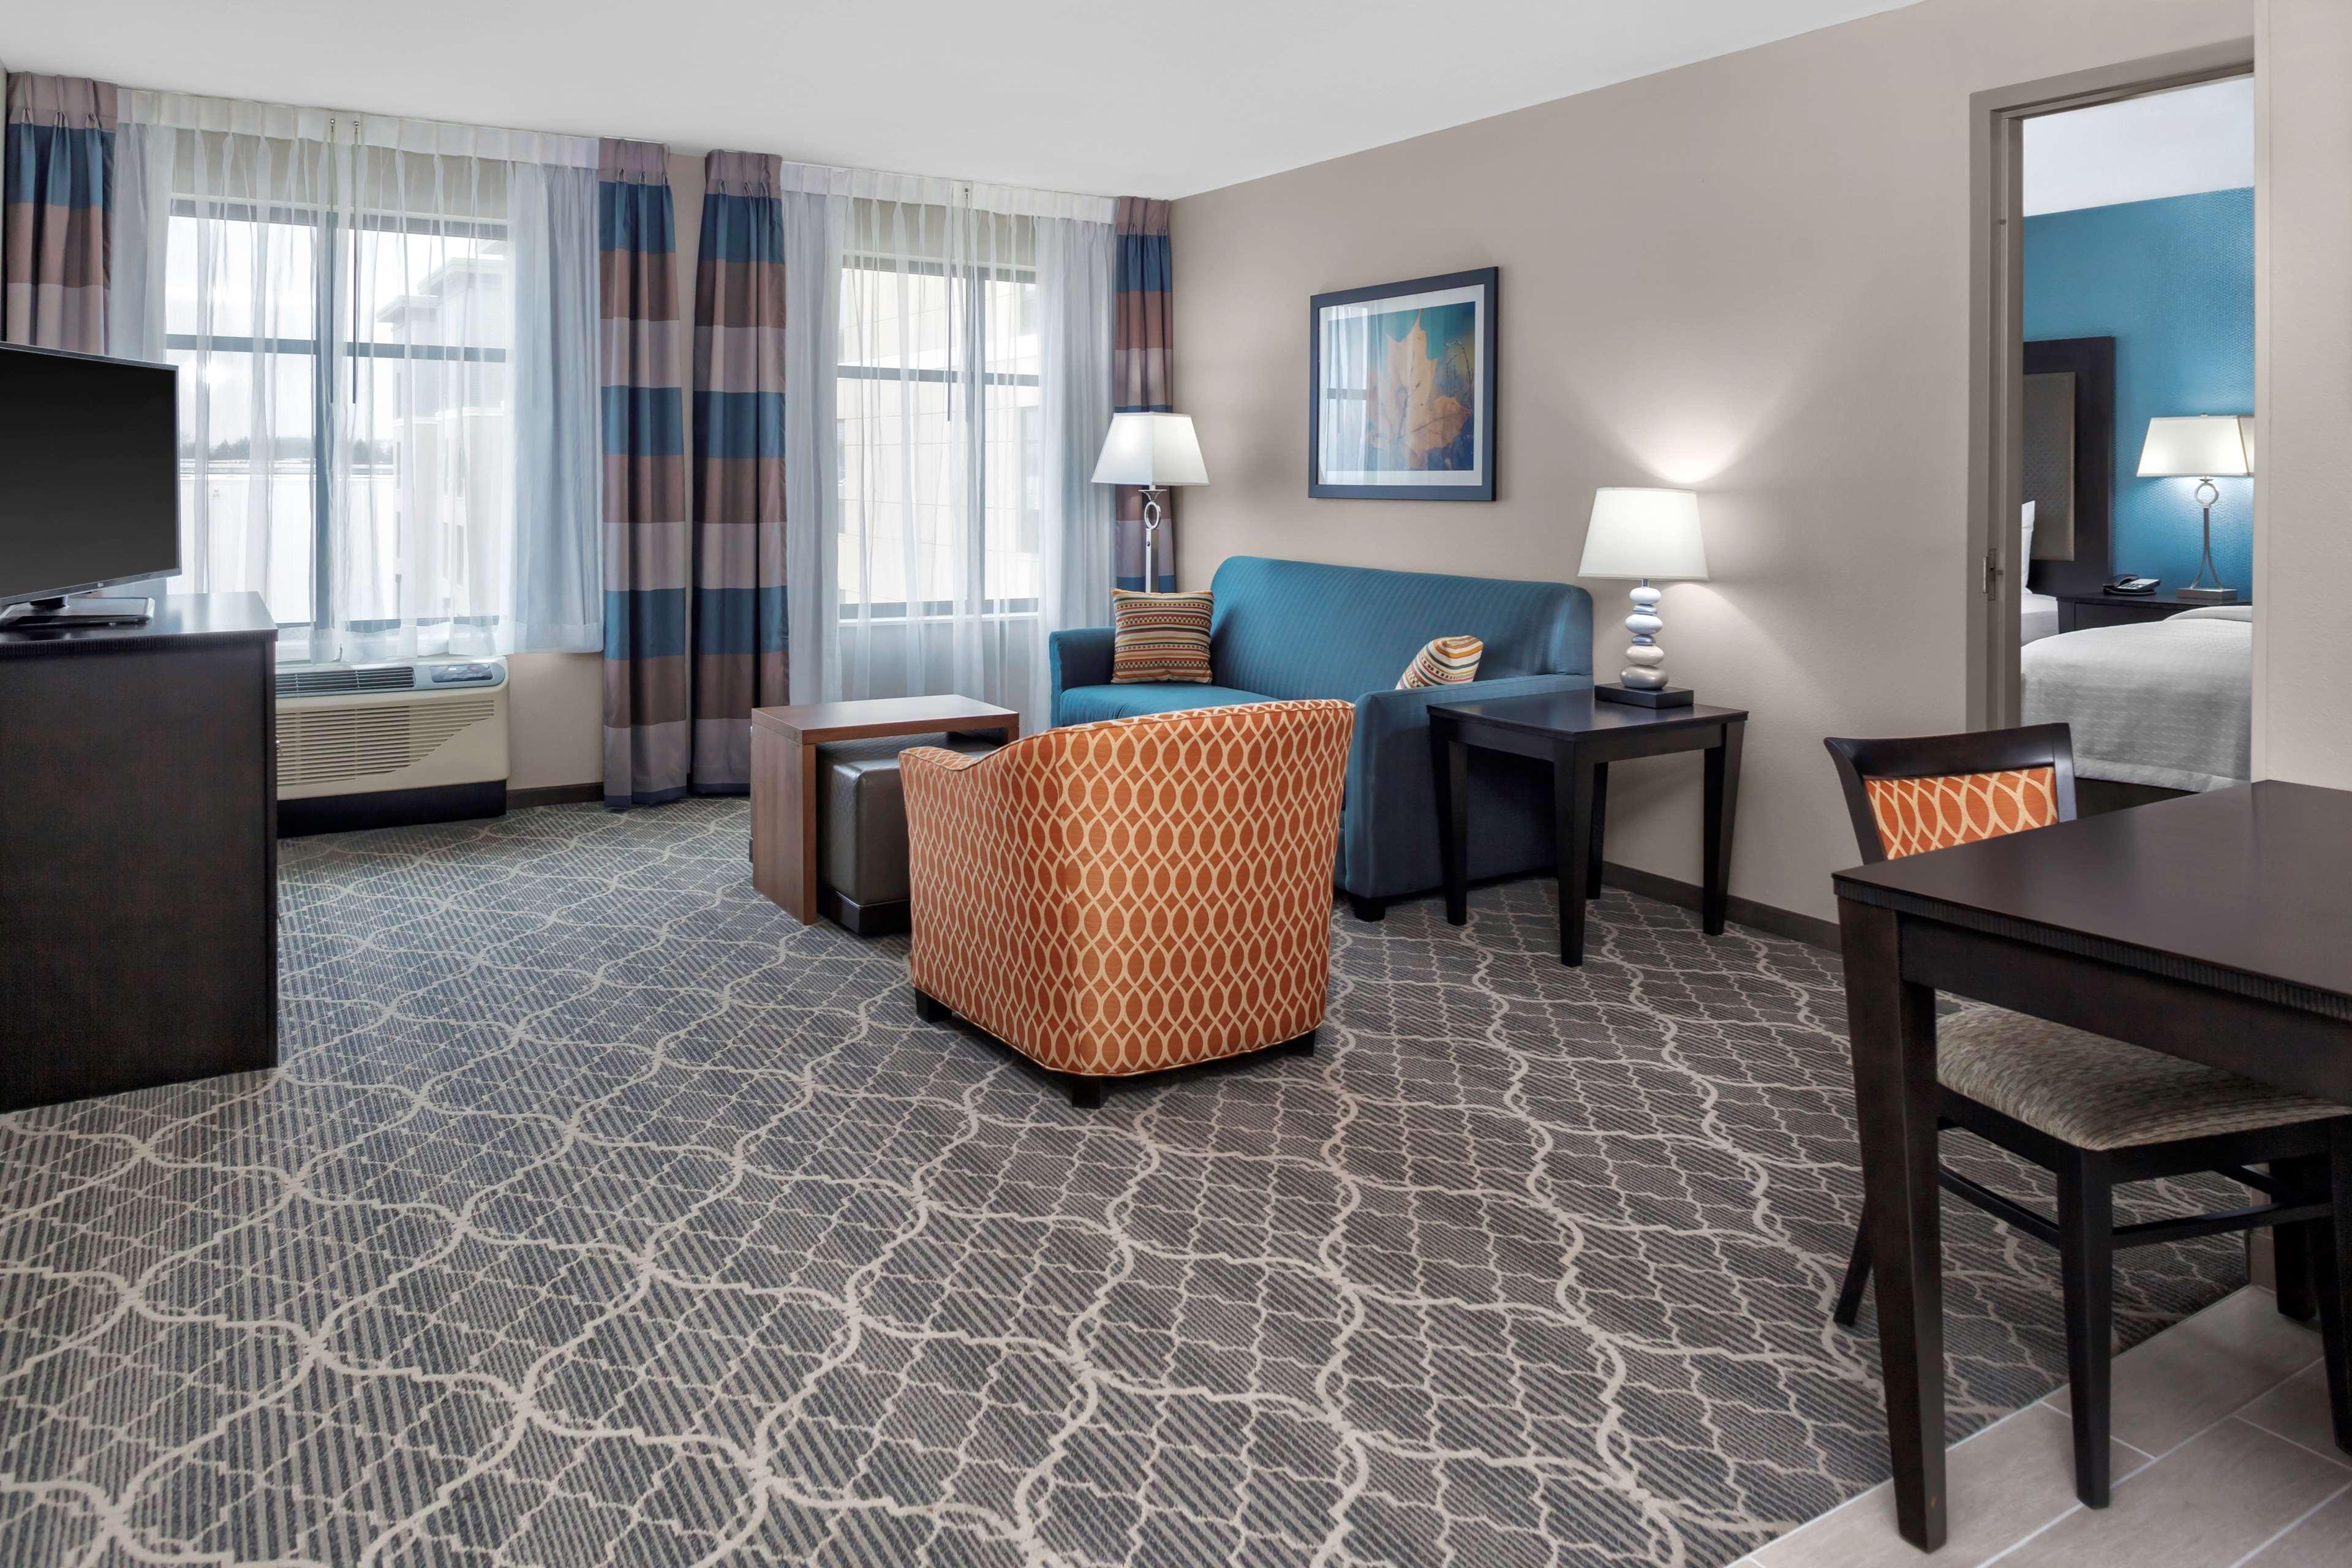 Homewood Suites by Hilton Wauwatosa Milwaukee image 11